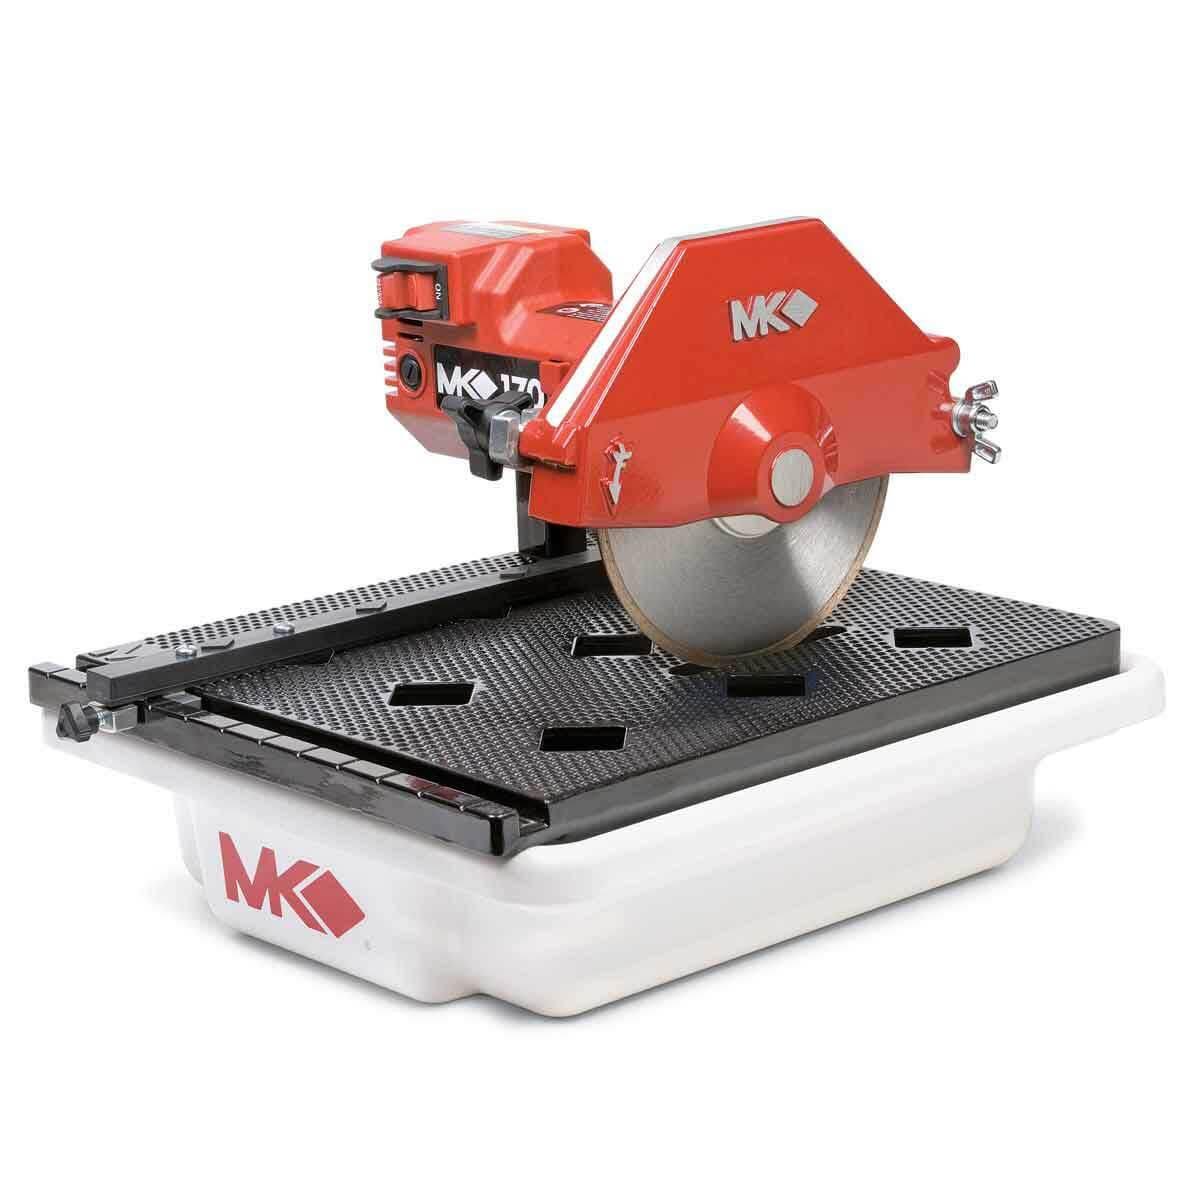 Mk 170 7 Inch Bench Tile Saw